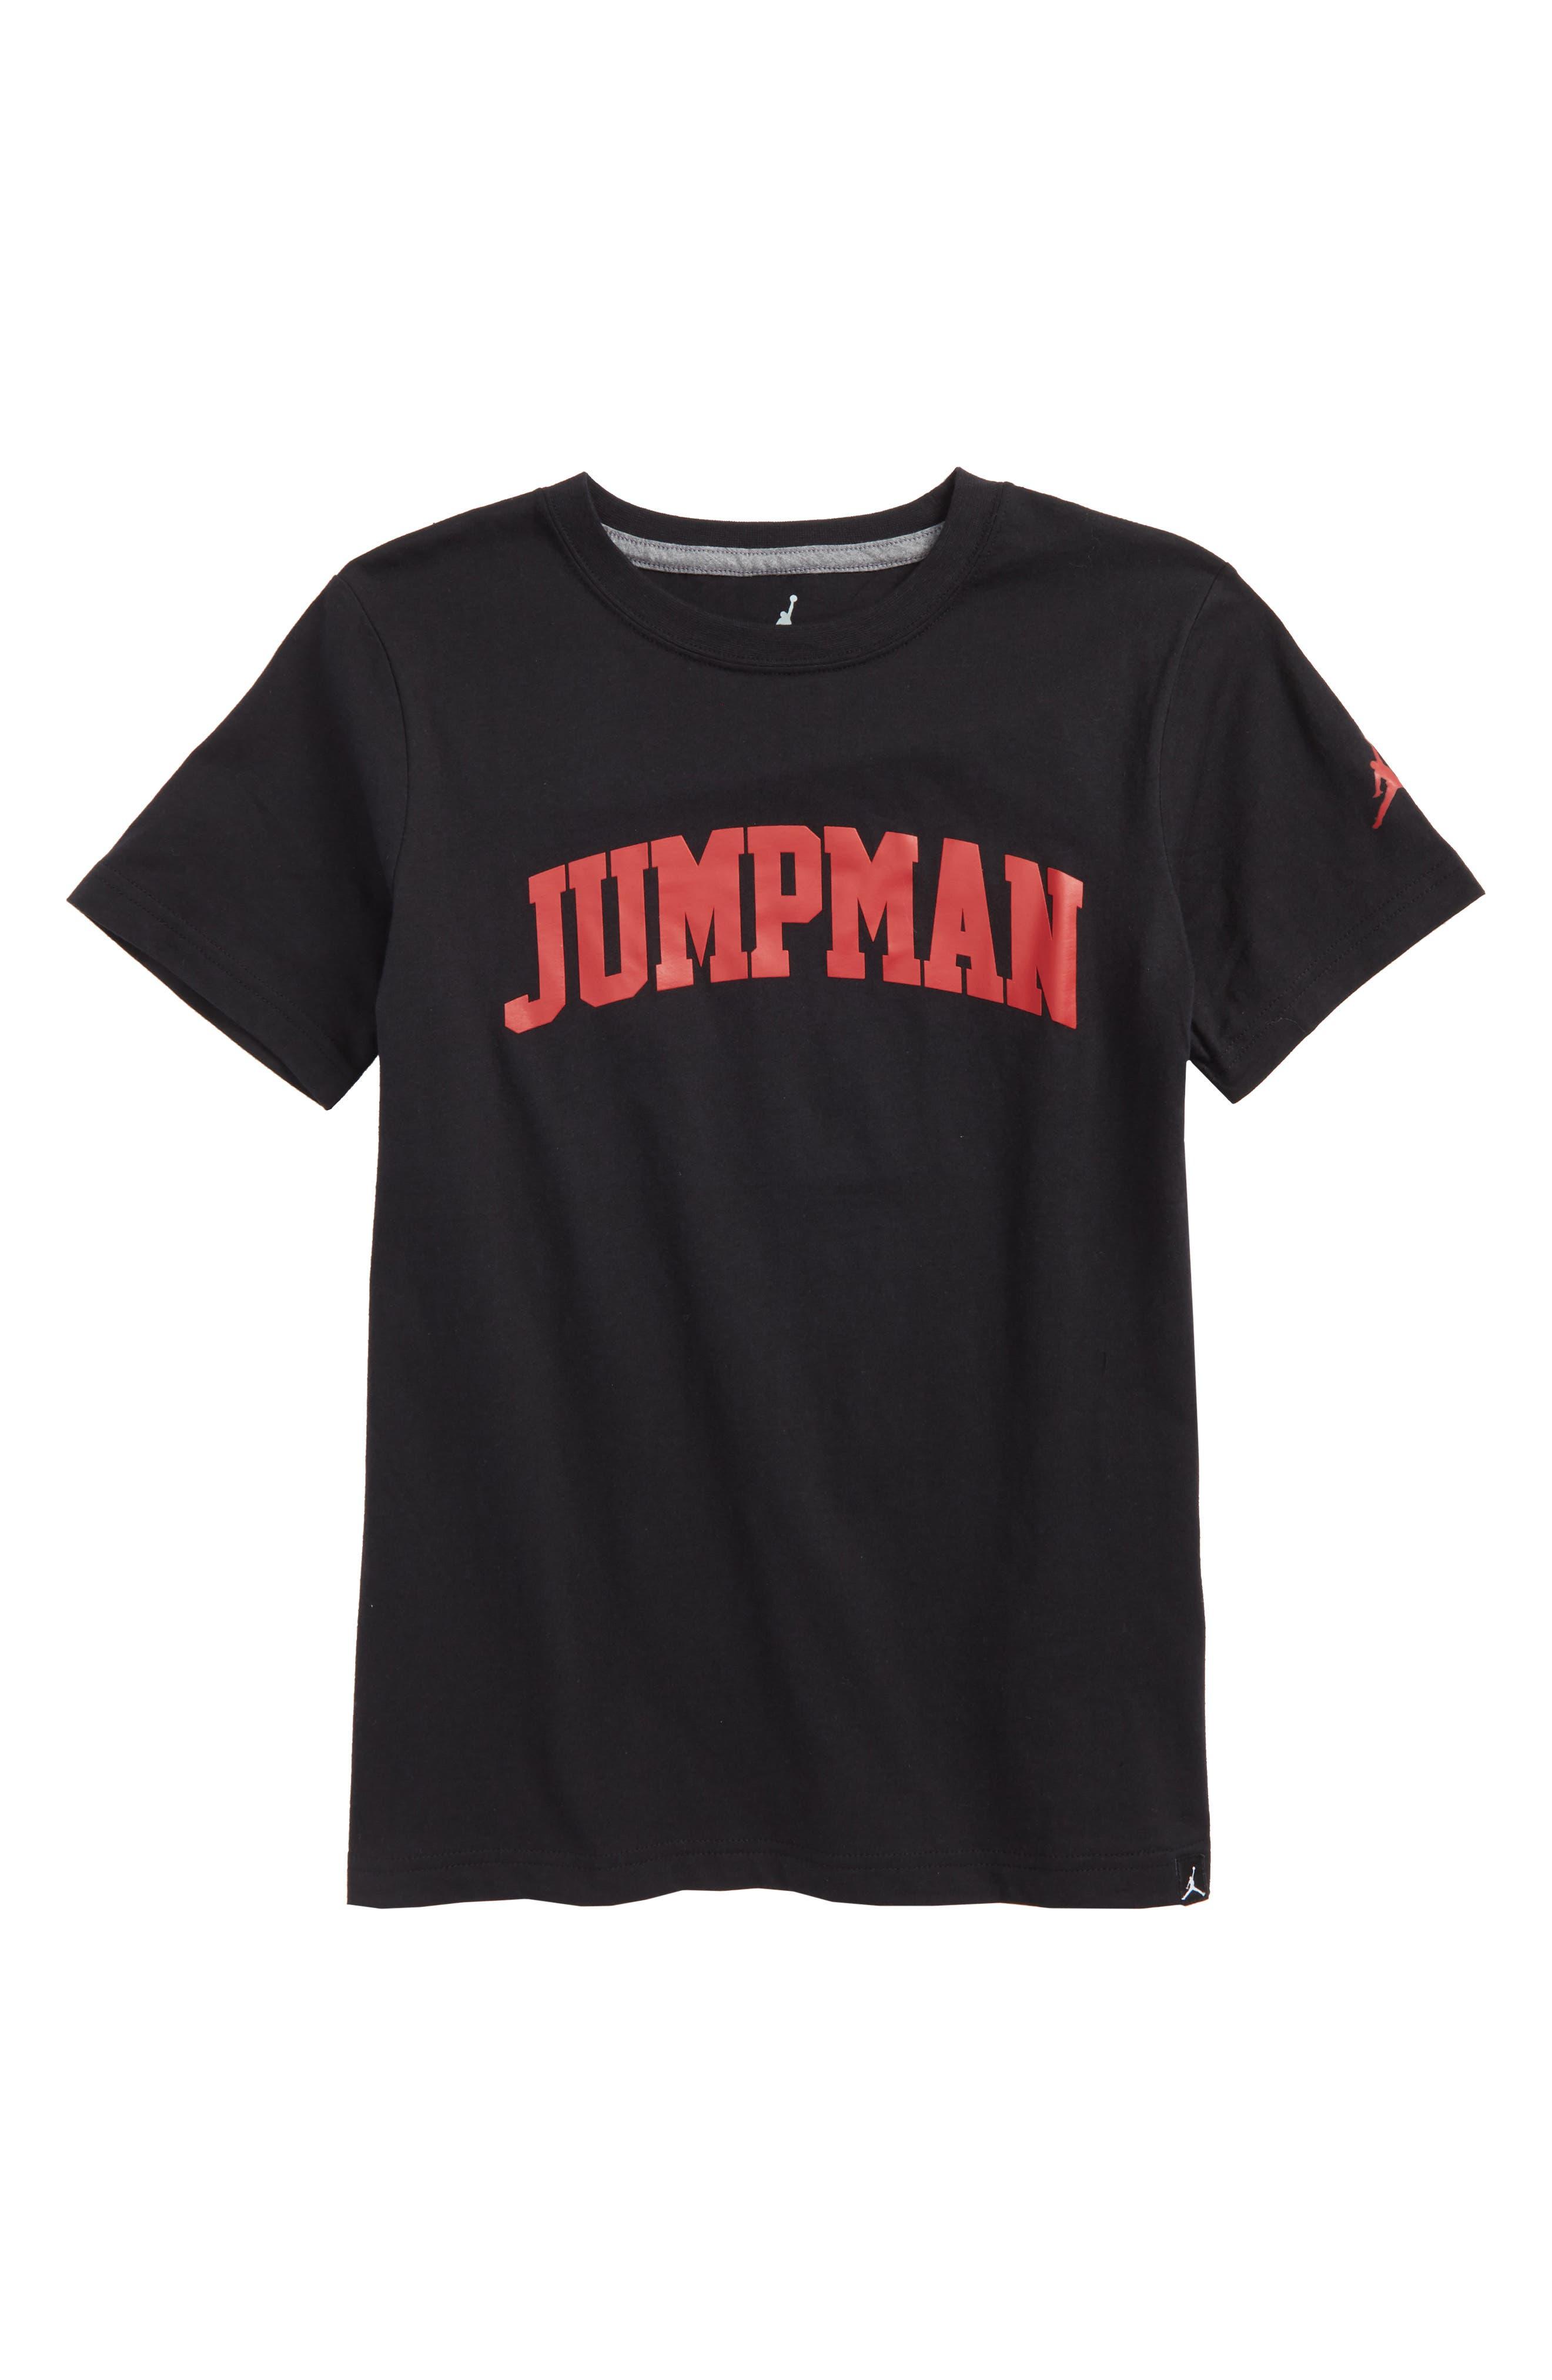 Jordan Brand Graphic T-Shirt,                             Main thumbnail 1, color,                             Black